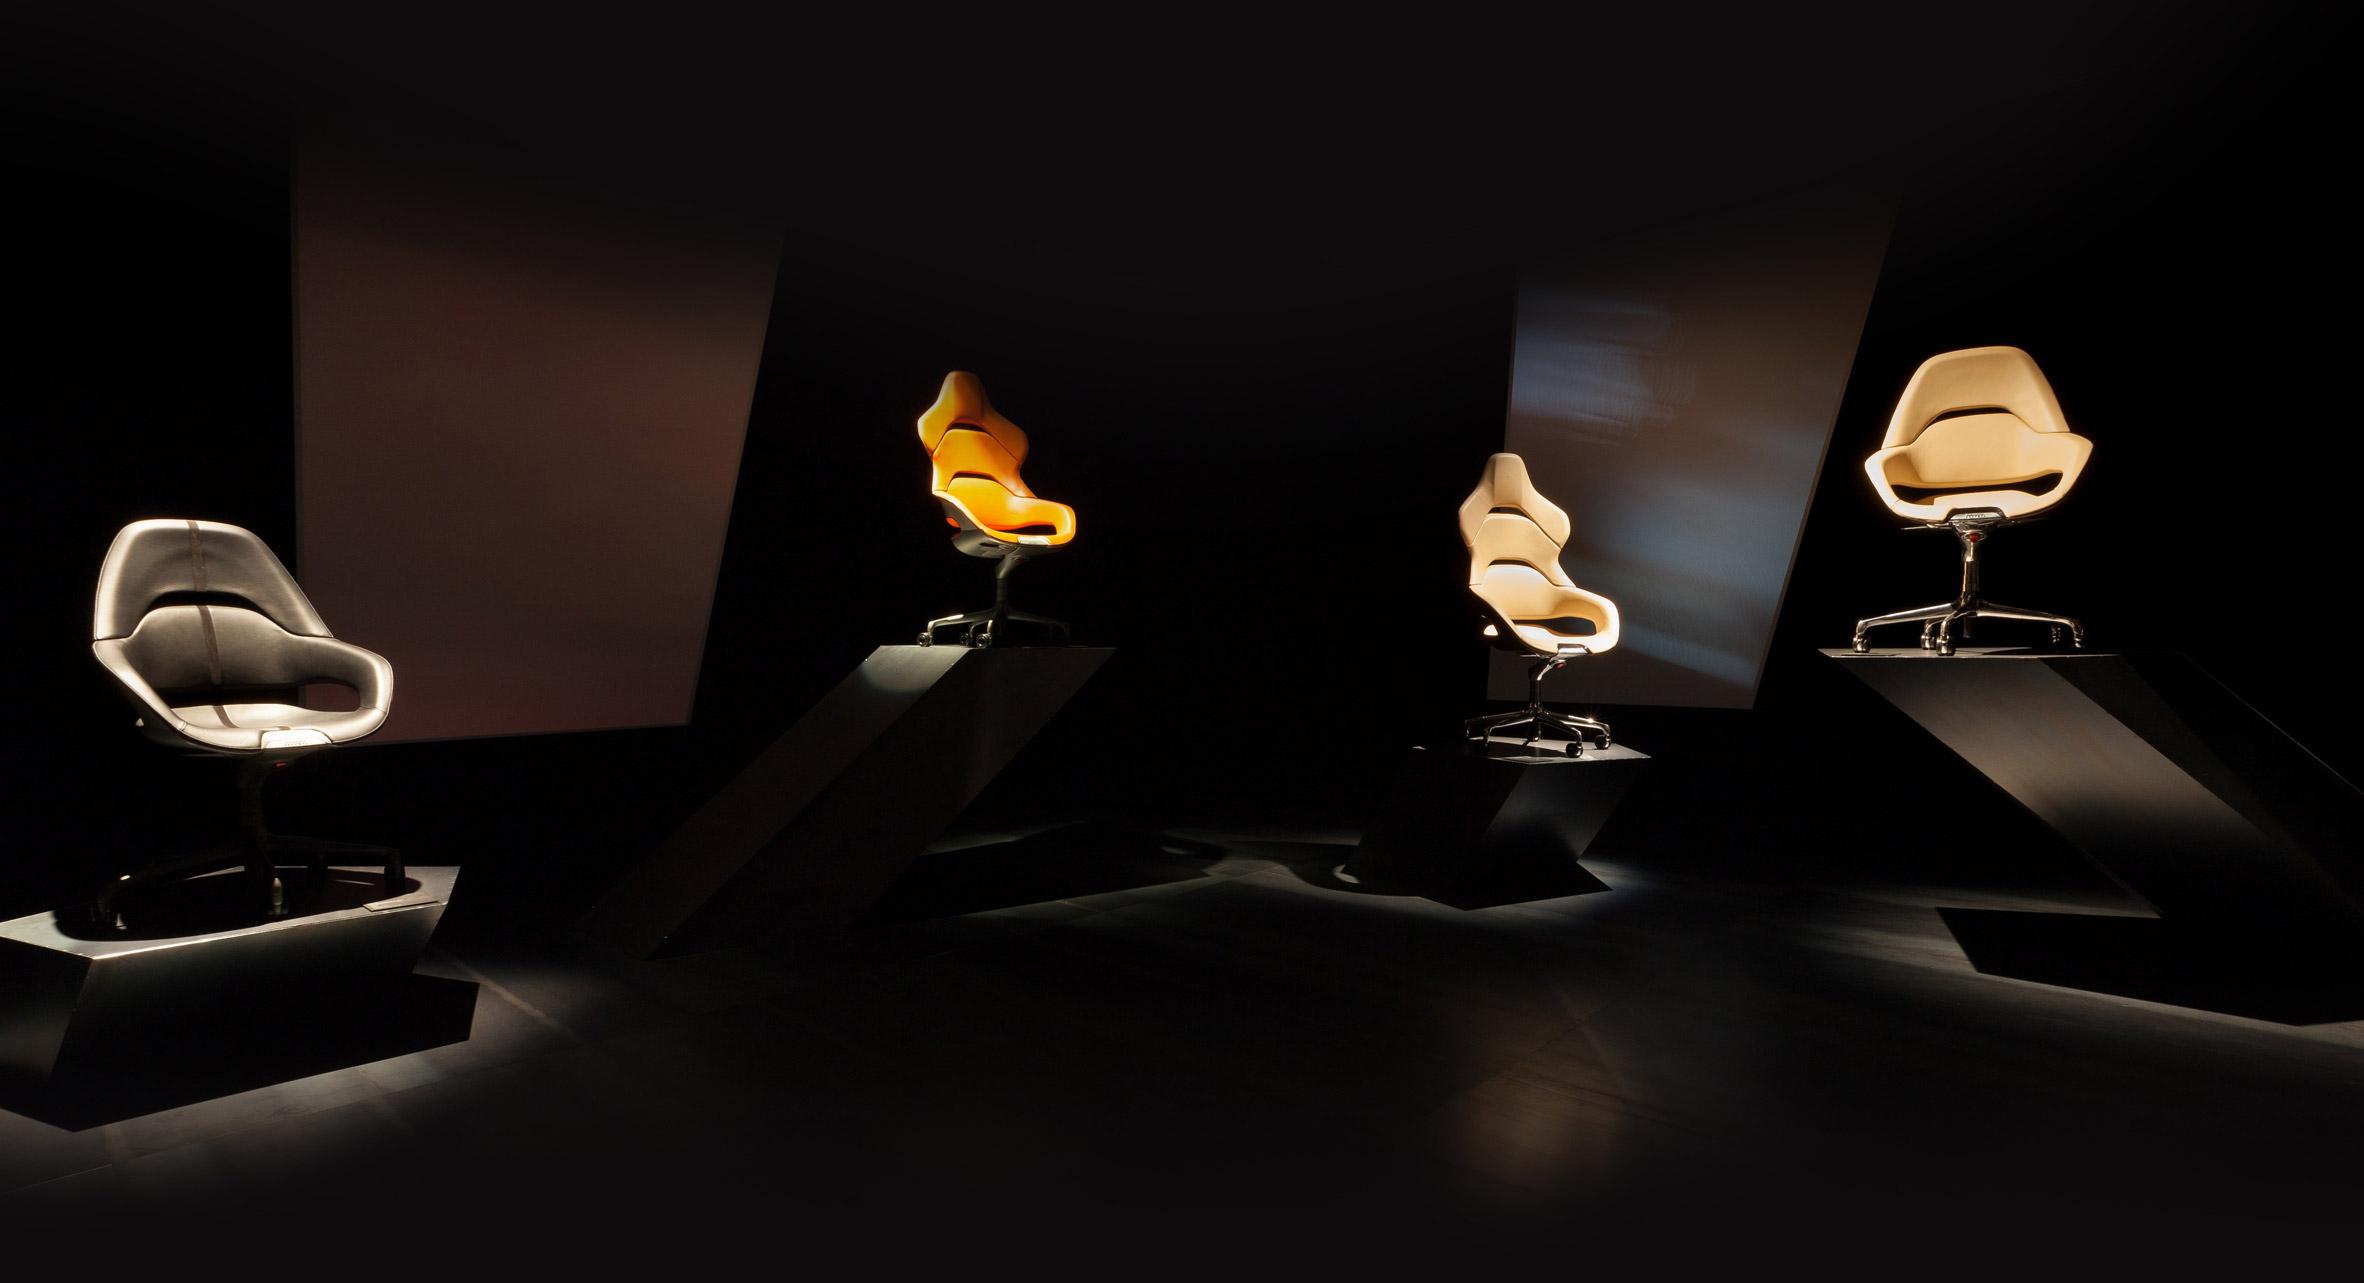 Ferrari design team creates Cockpit office chair for Poltrona Frau